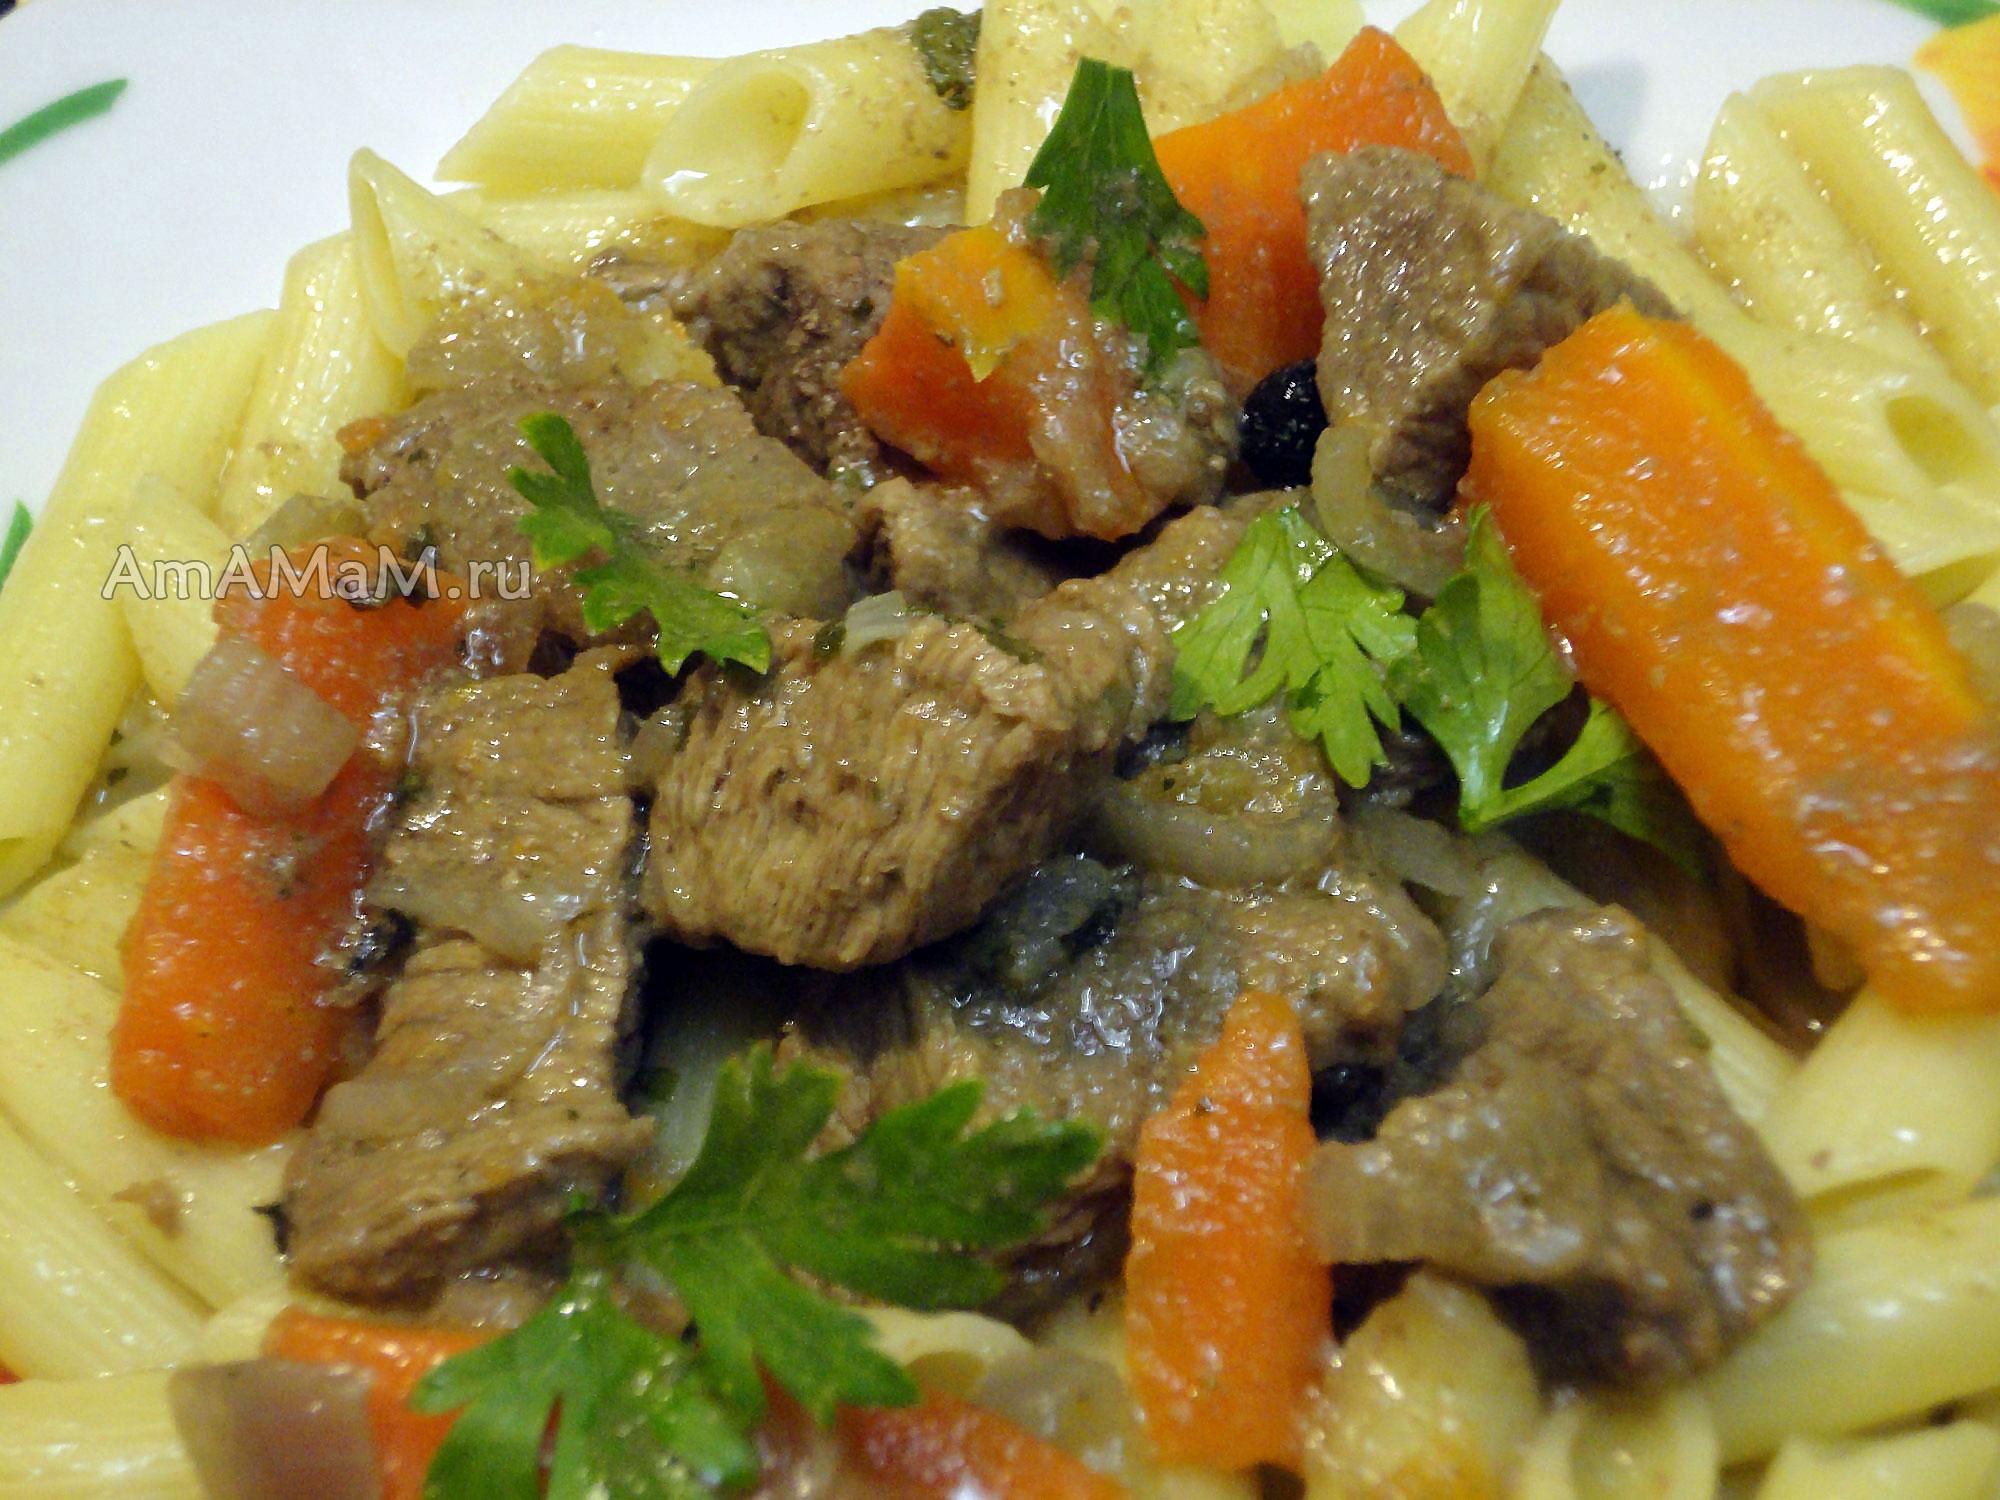 Говядина с овощами рецепт пошагово